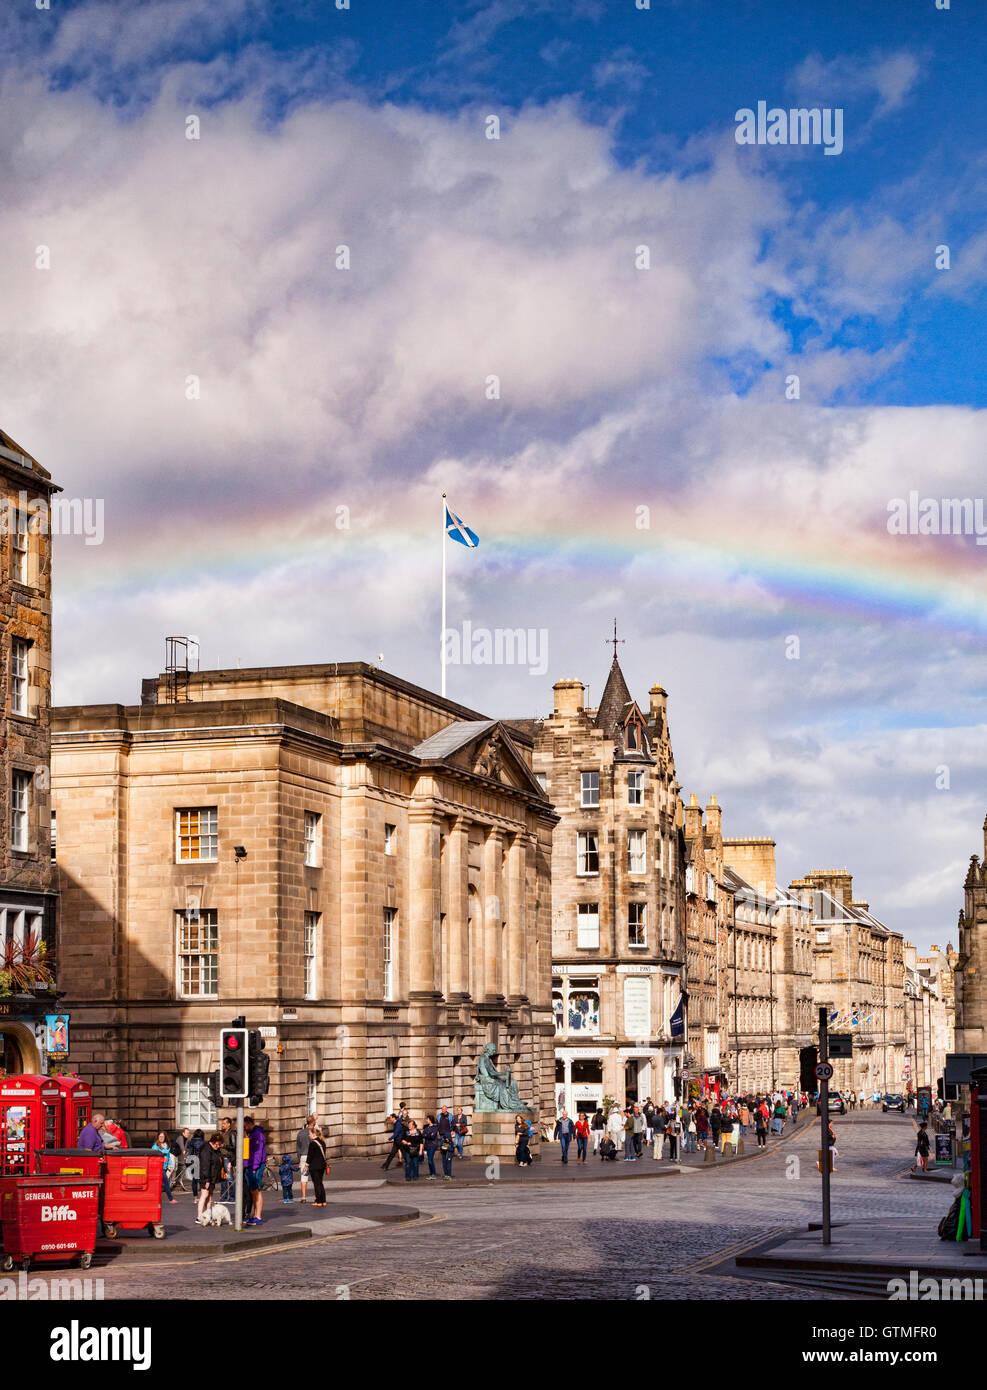 The Royal Mile, Edinburgh, with a rainbow, Scotland, UK Stock Photo